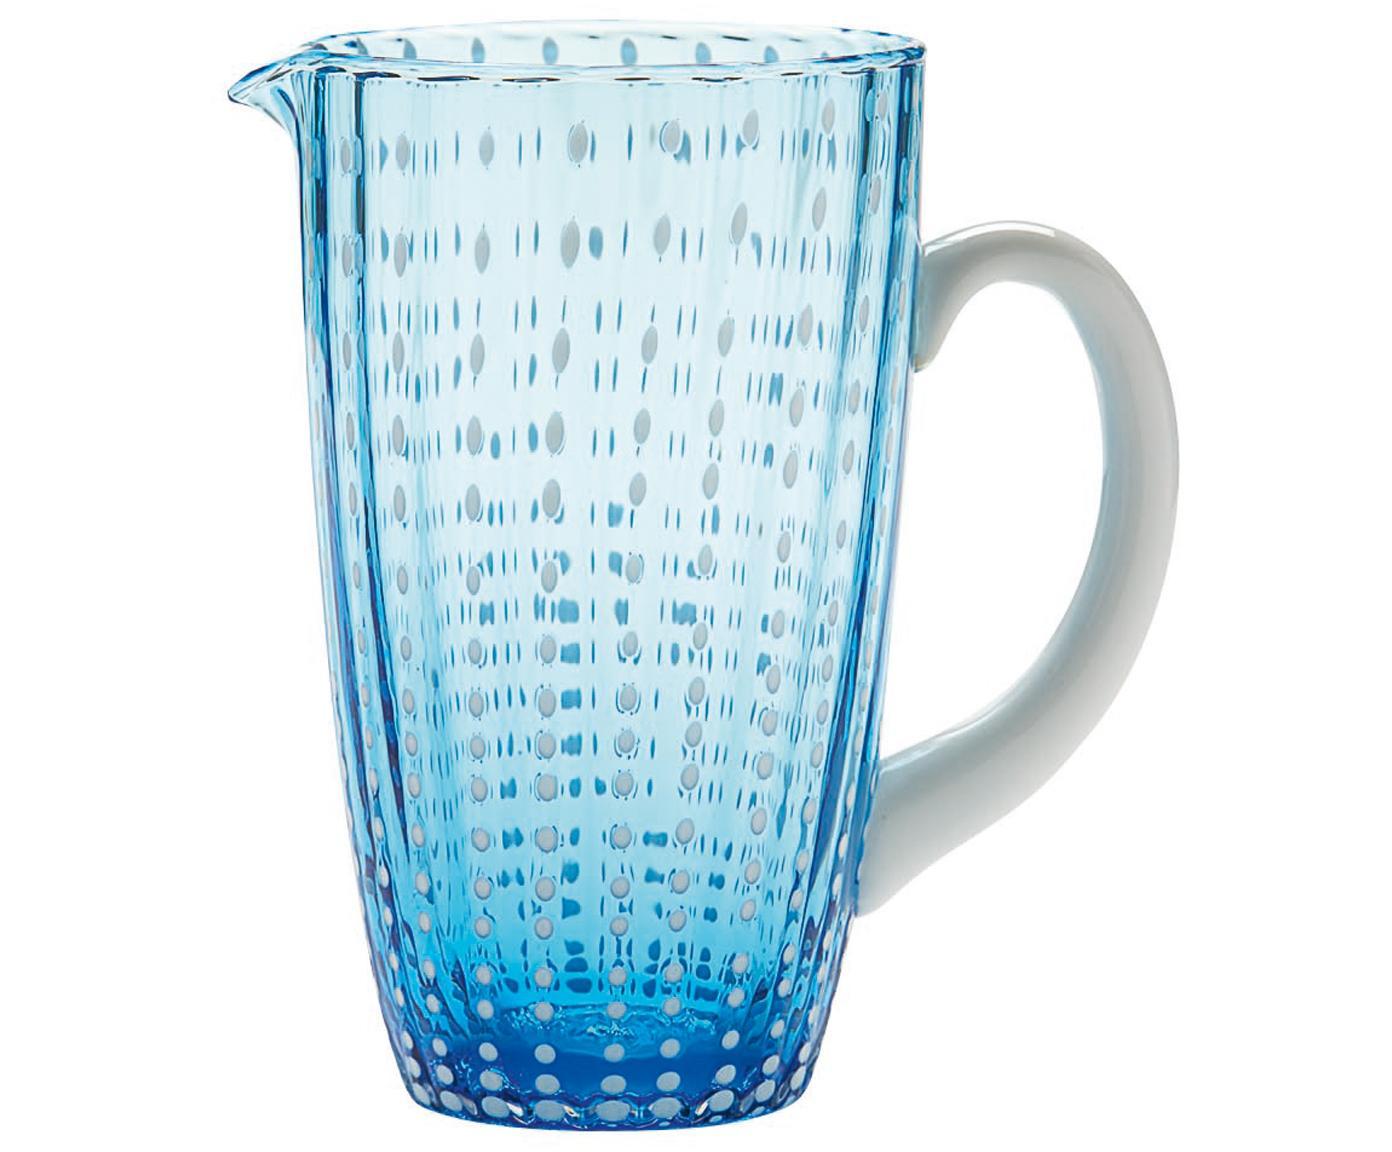 Jarra sopada a mano Perle, Vidrio, Azul transparente, blanco, 1.6 L